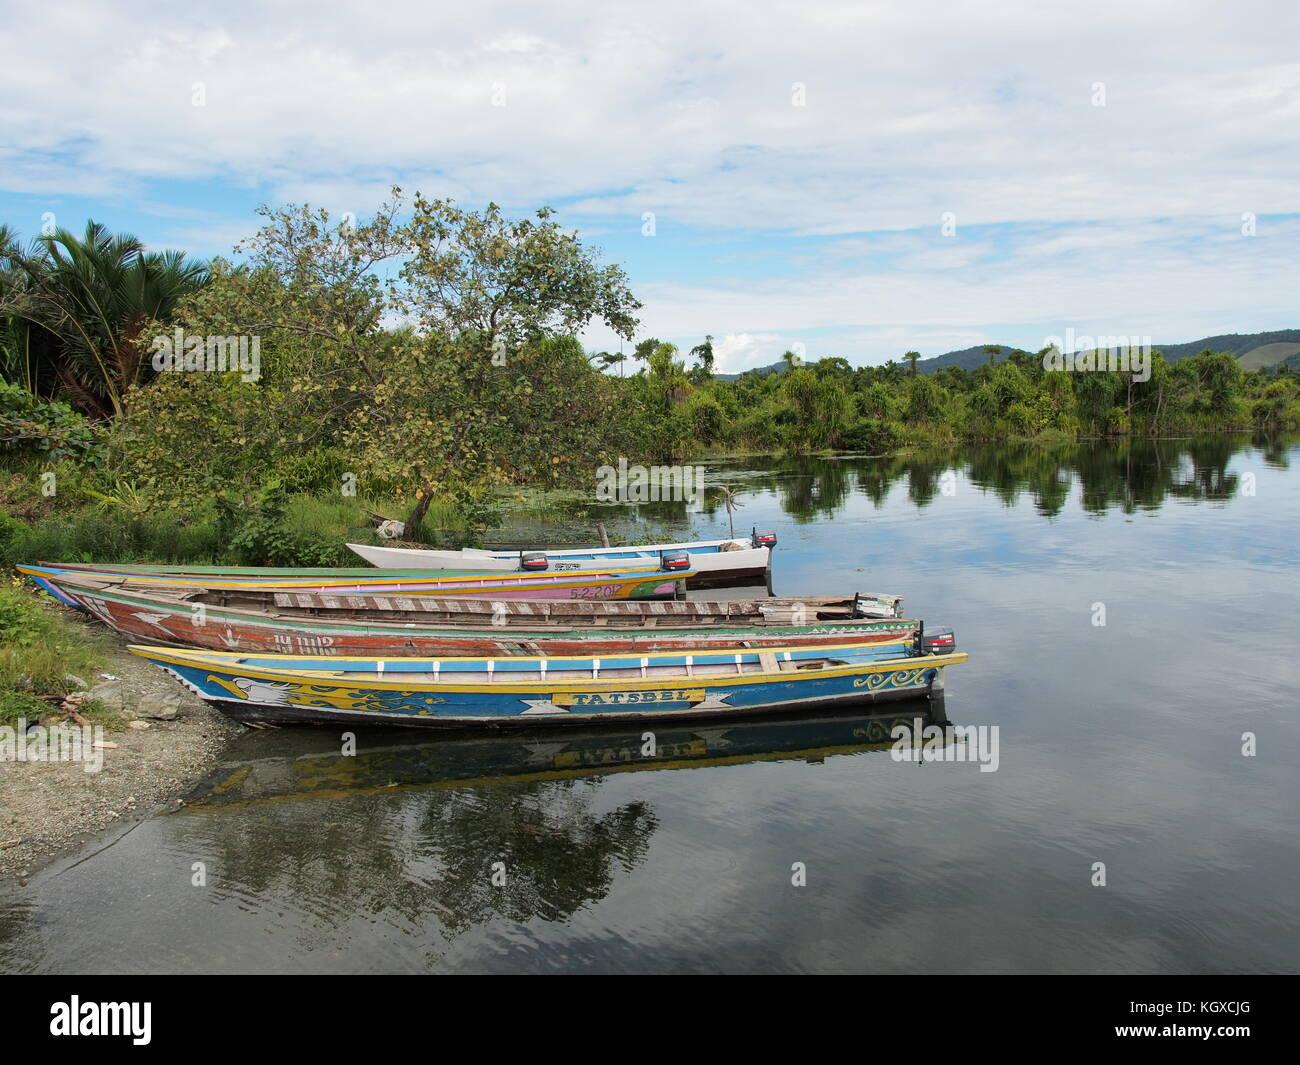 Colorful boats at Lake Sentani, Papua - Stock Image